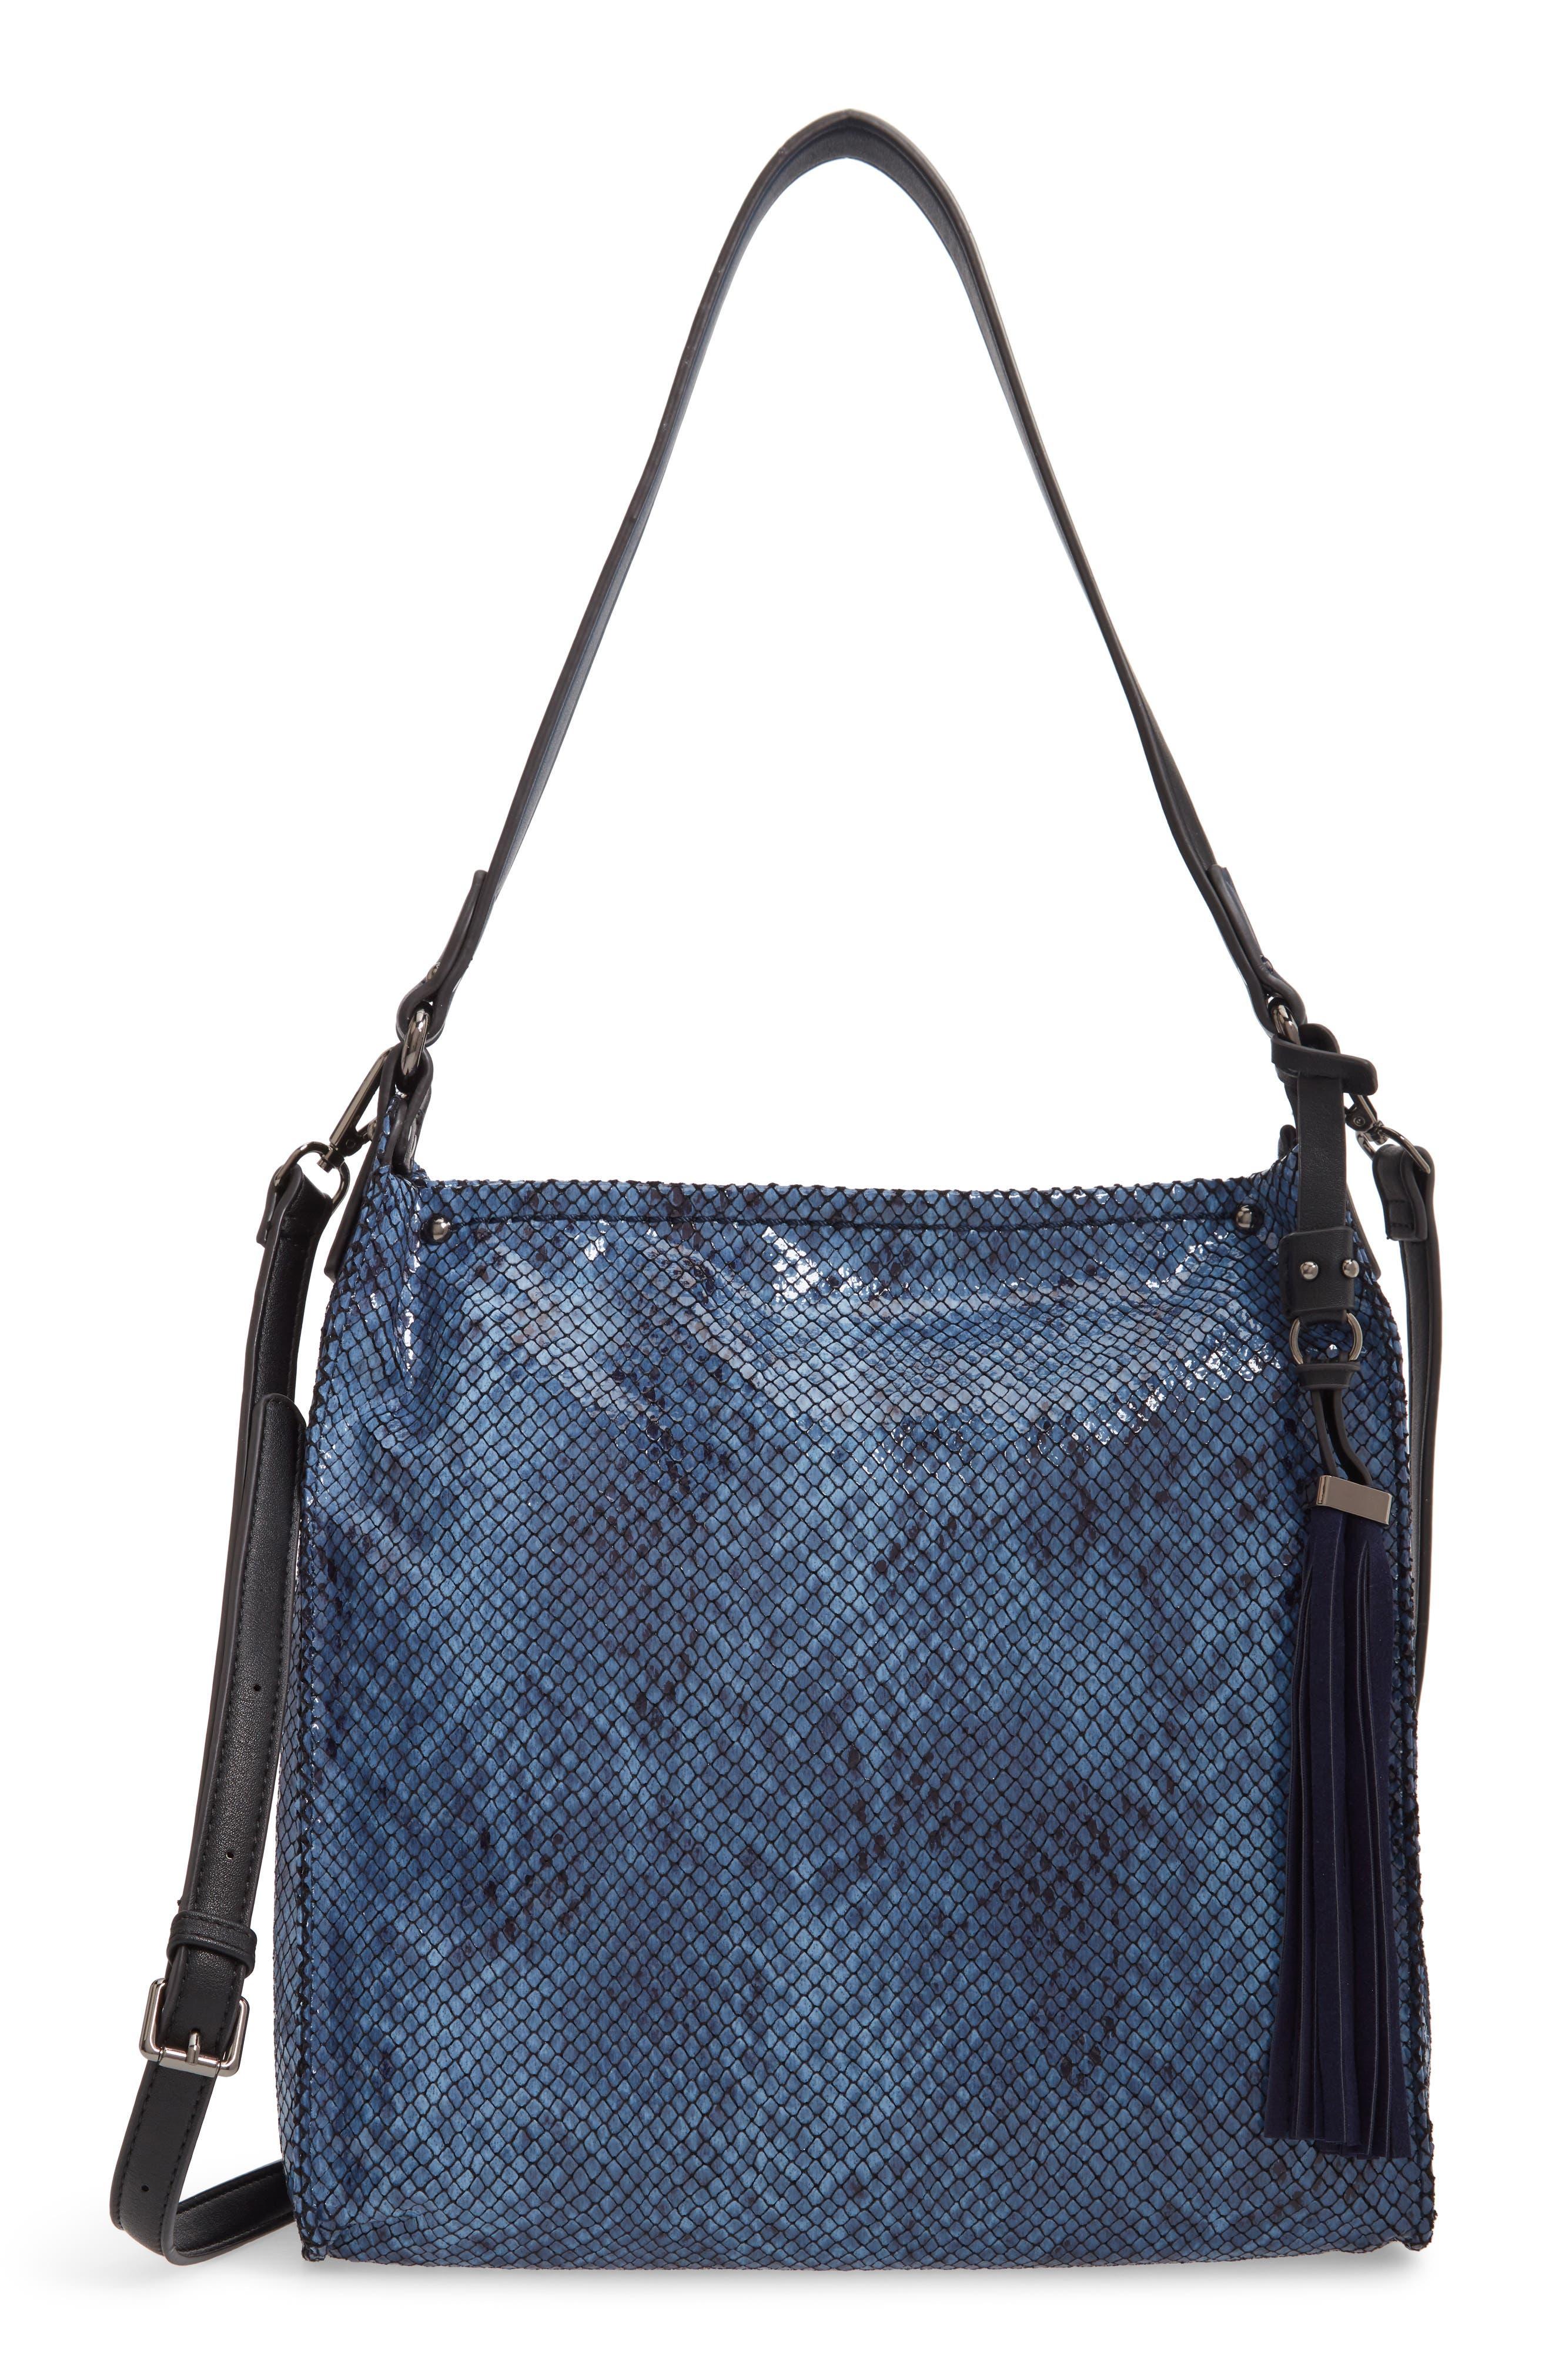 SONDRA ROBERTS Snake Embossed Faux Leather Hobo - Blue in Denim